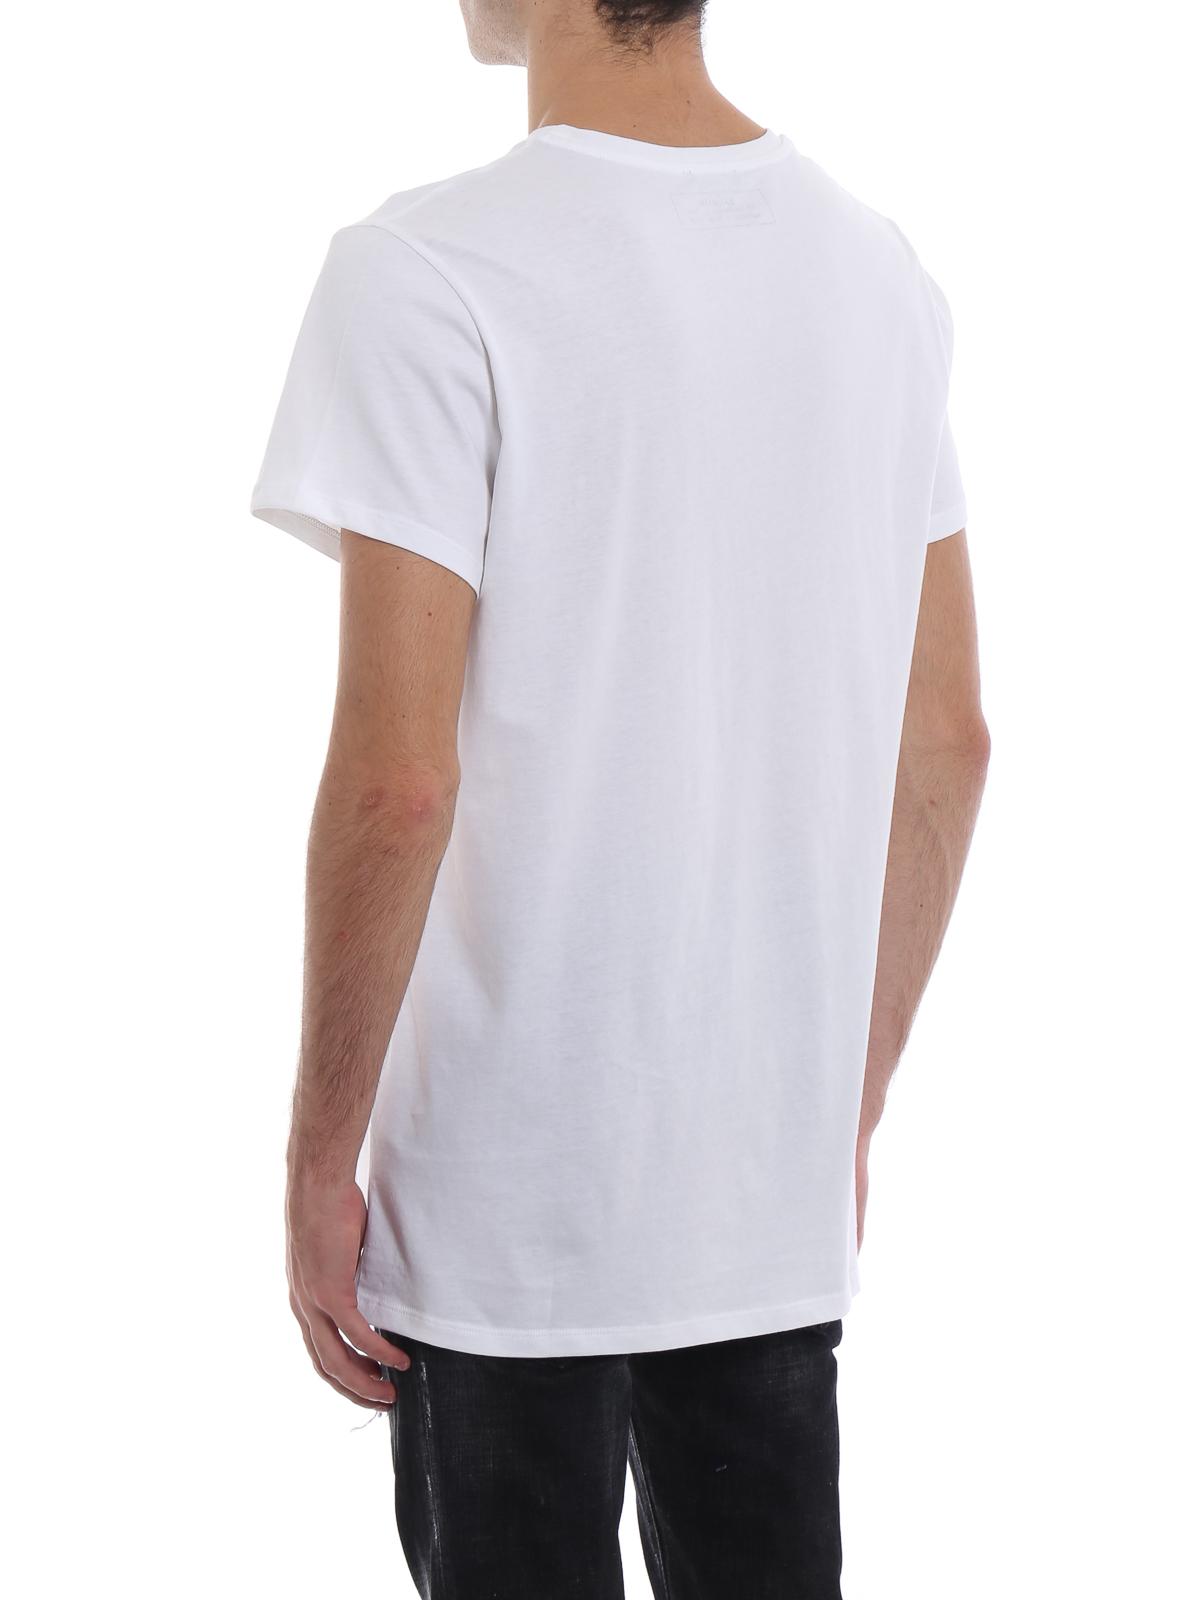 Balmain Balmain Paris rubberized logo cotton T shirt t